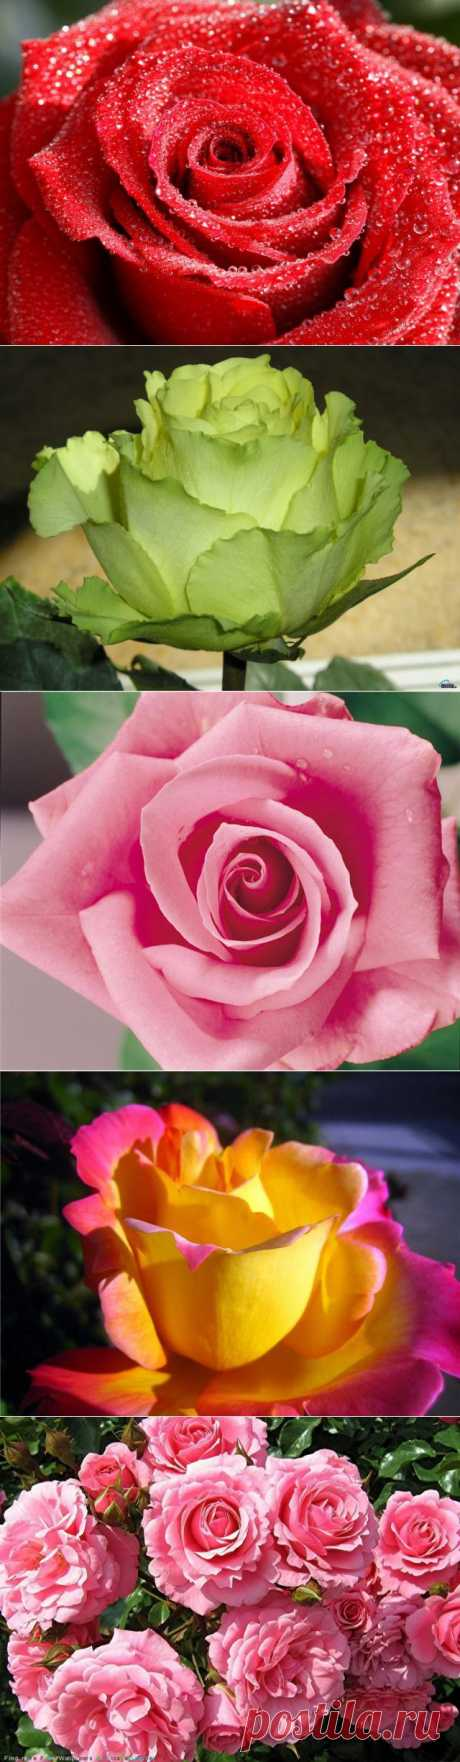 розы фото: 2 млн изображений найдено в Яндекс.Картинках